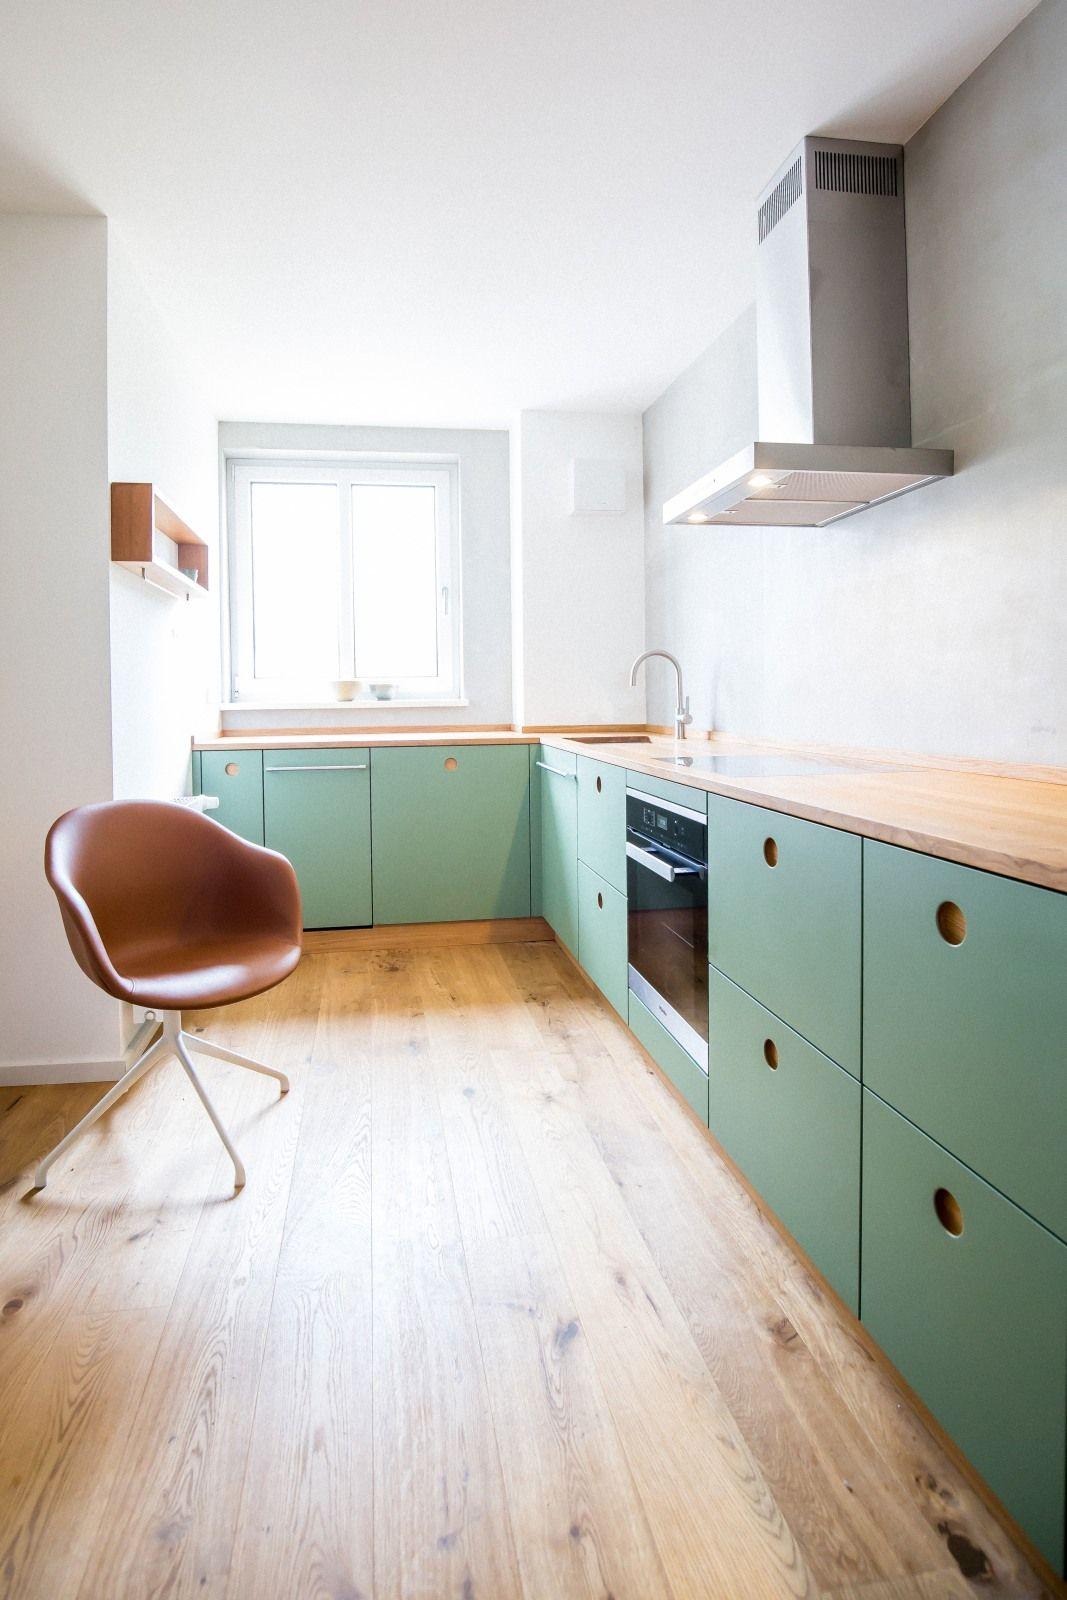 KuecheGruenlackiert Eichenarbeitsplatte Küche grün